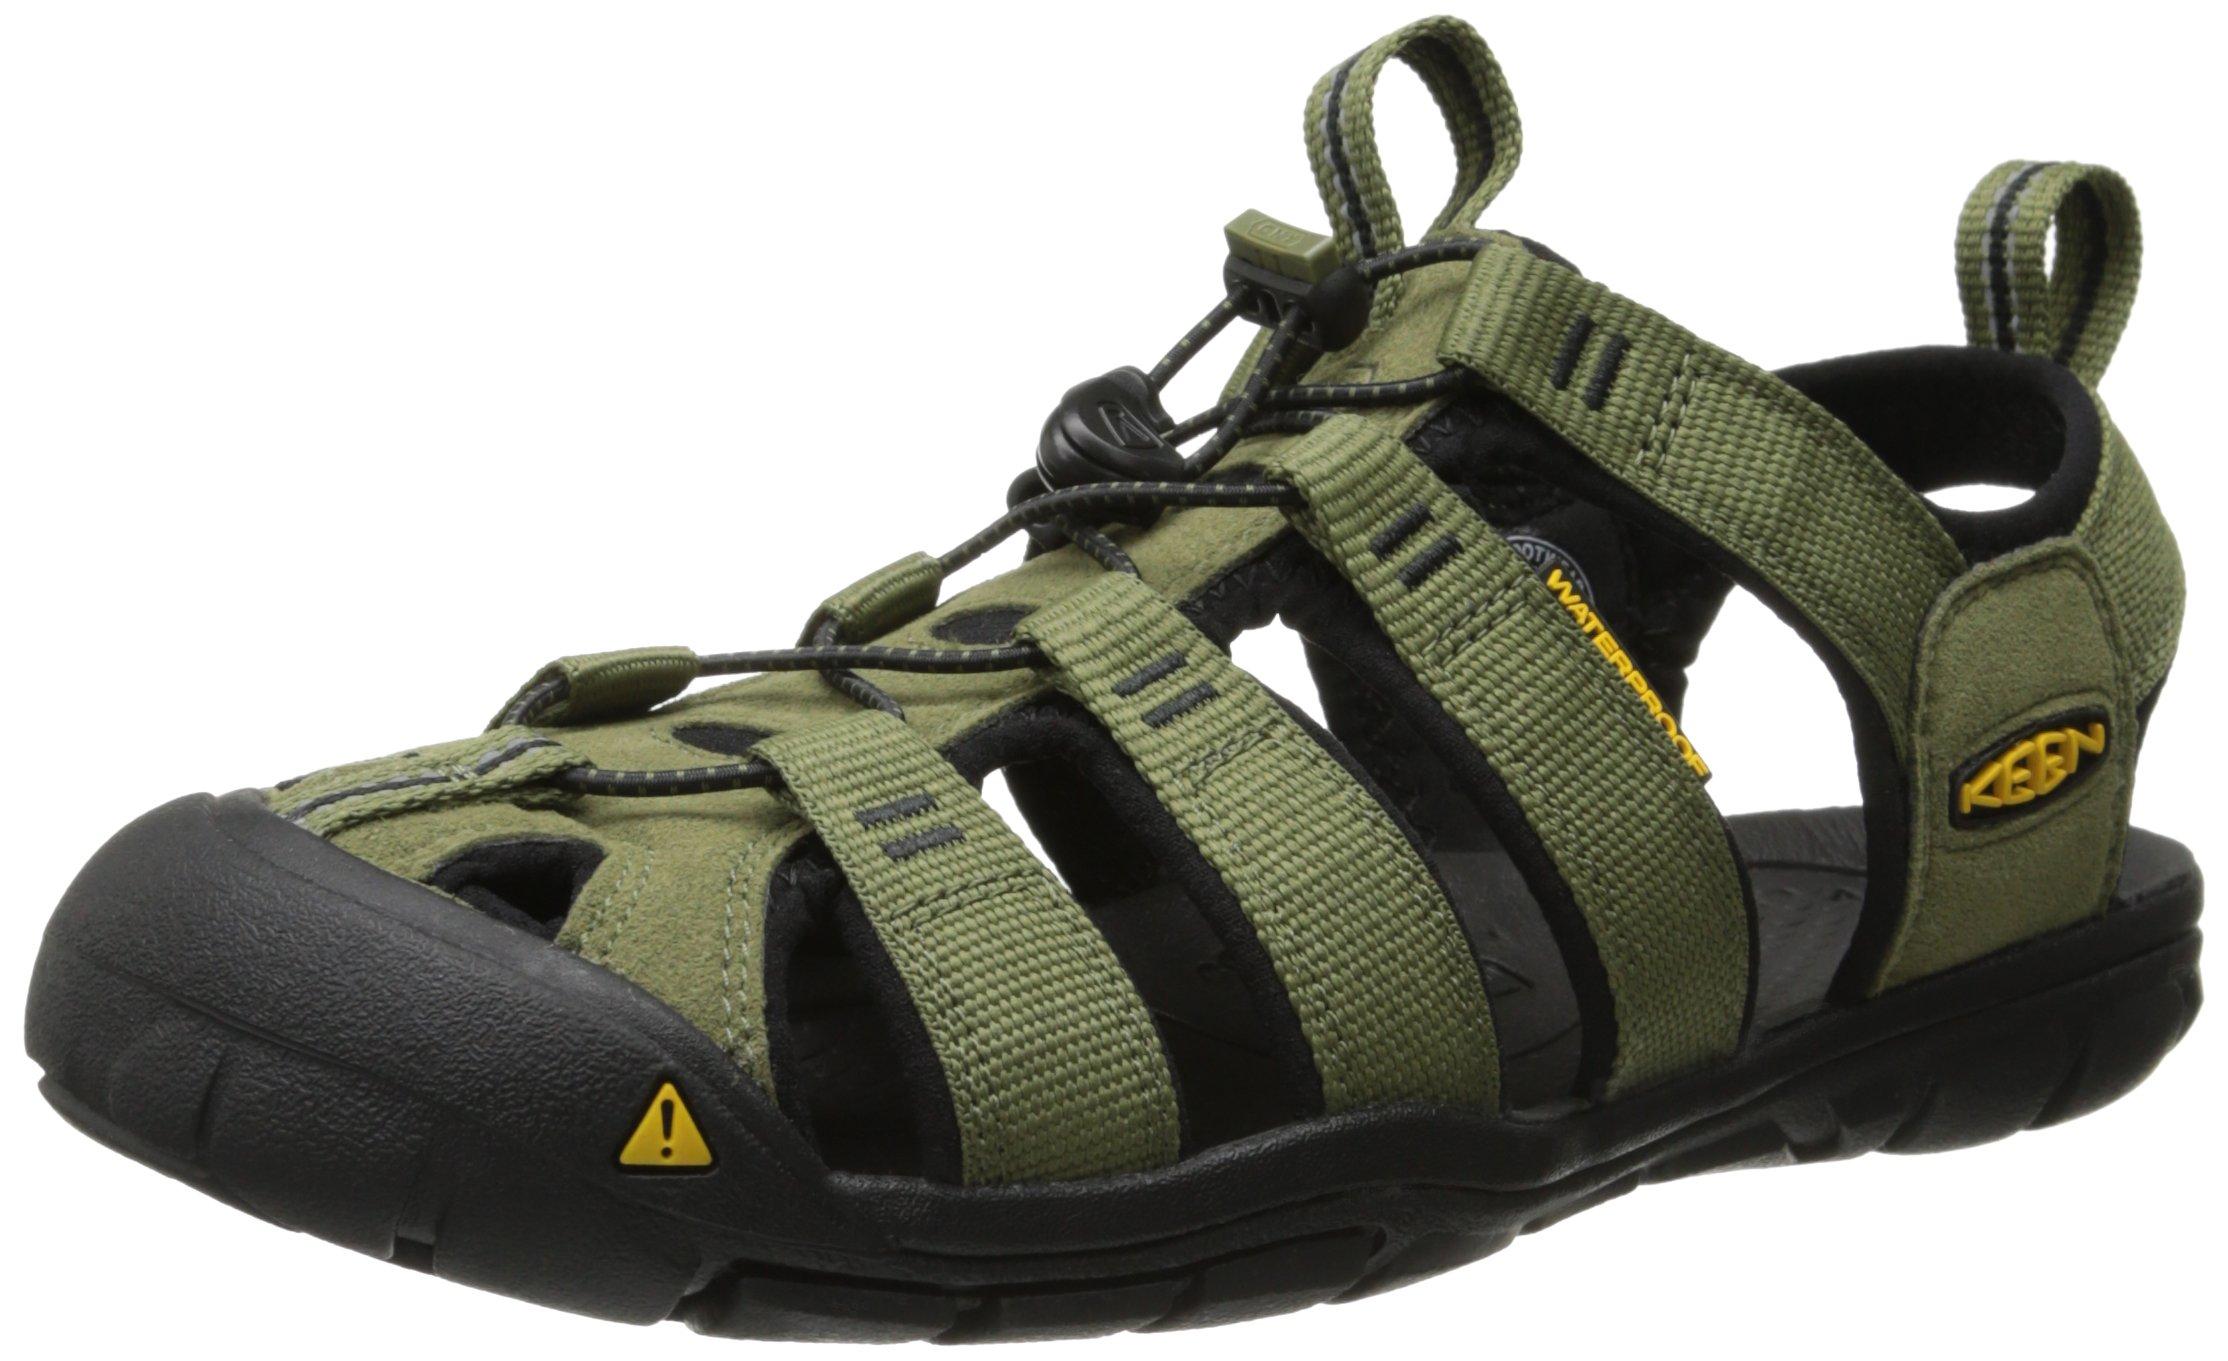 KEEN Men's Clearwater CNX Hybrid Shoe, Burnt Olive/Black, 8.5 M US